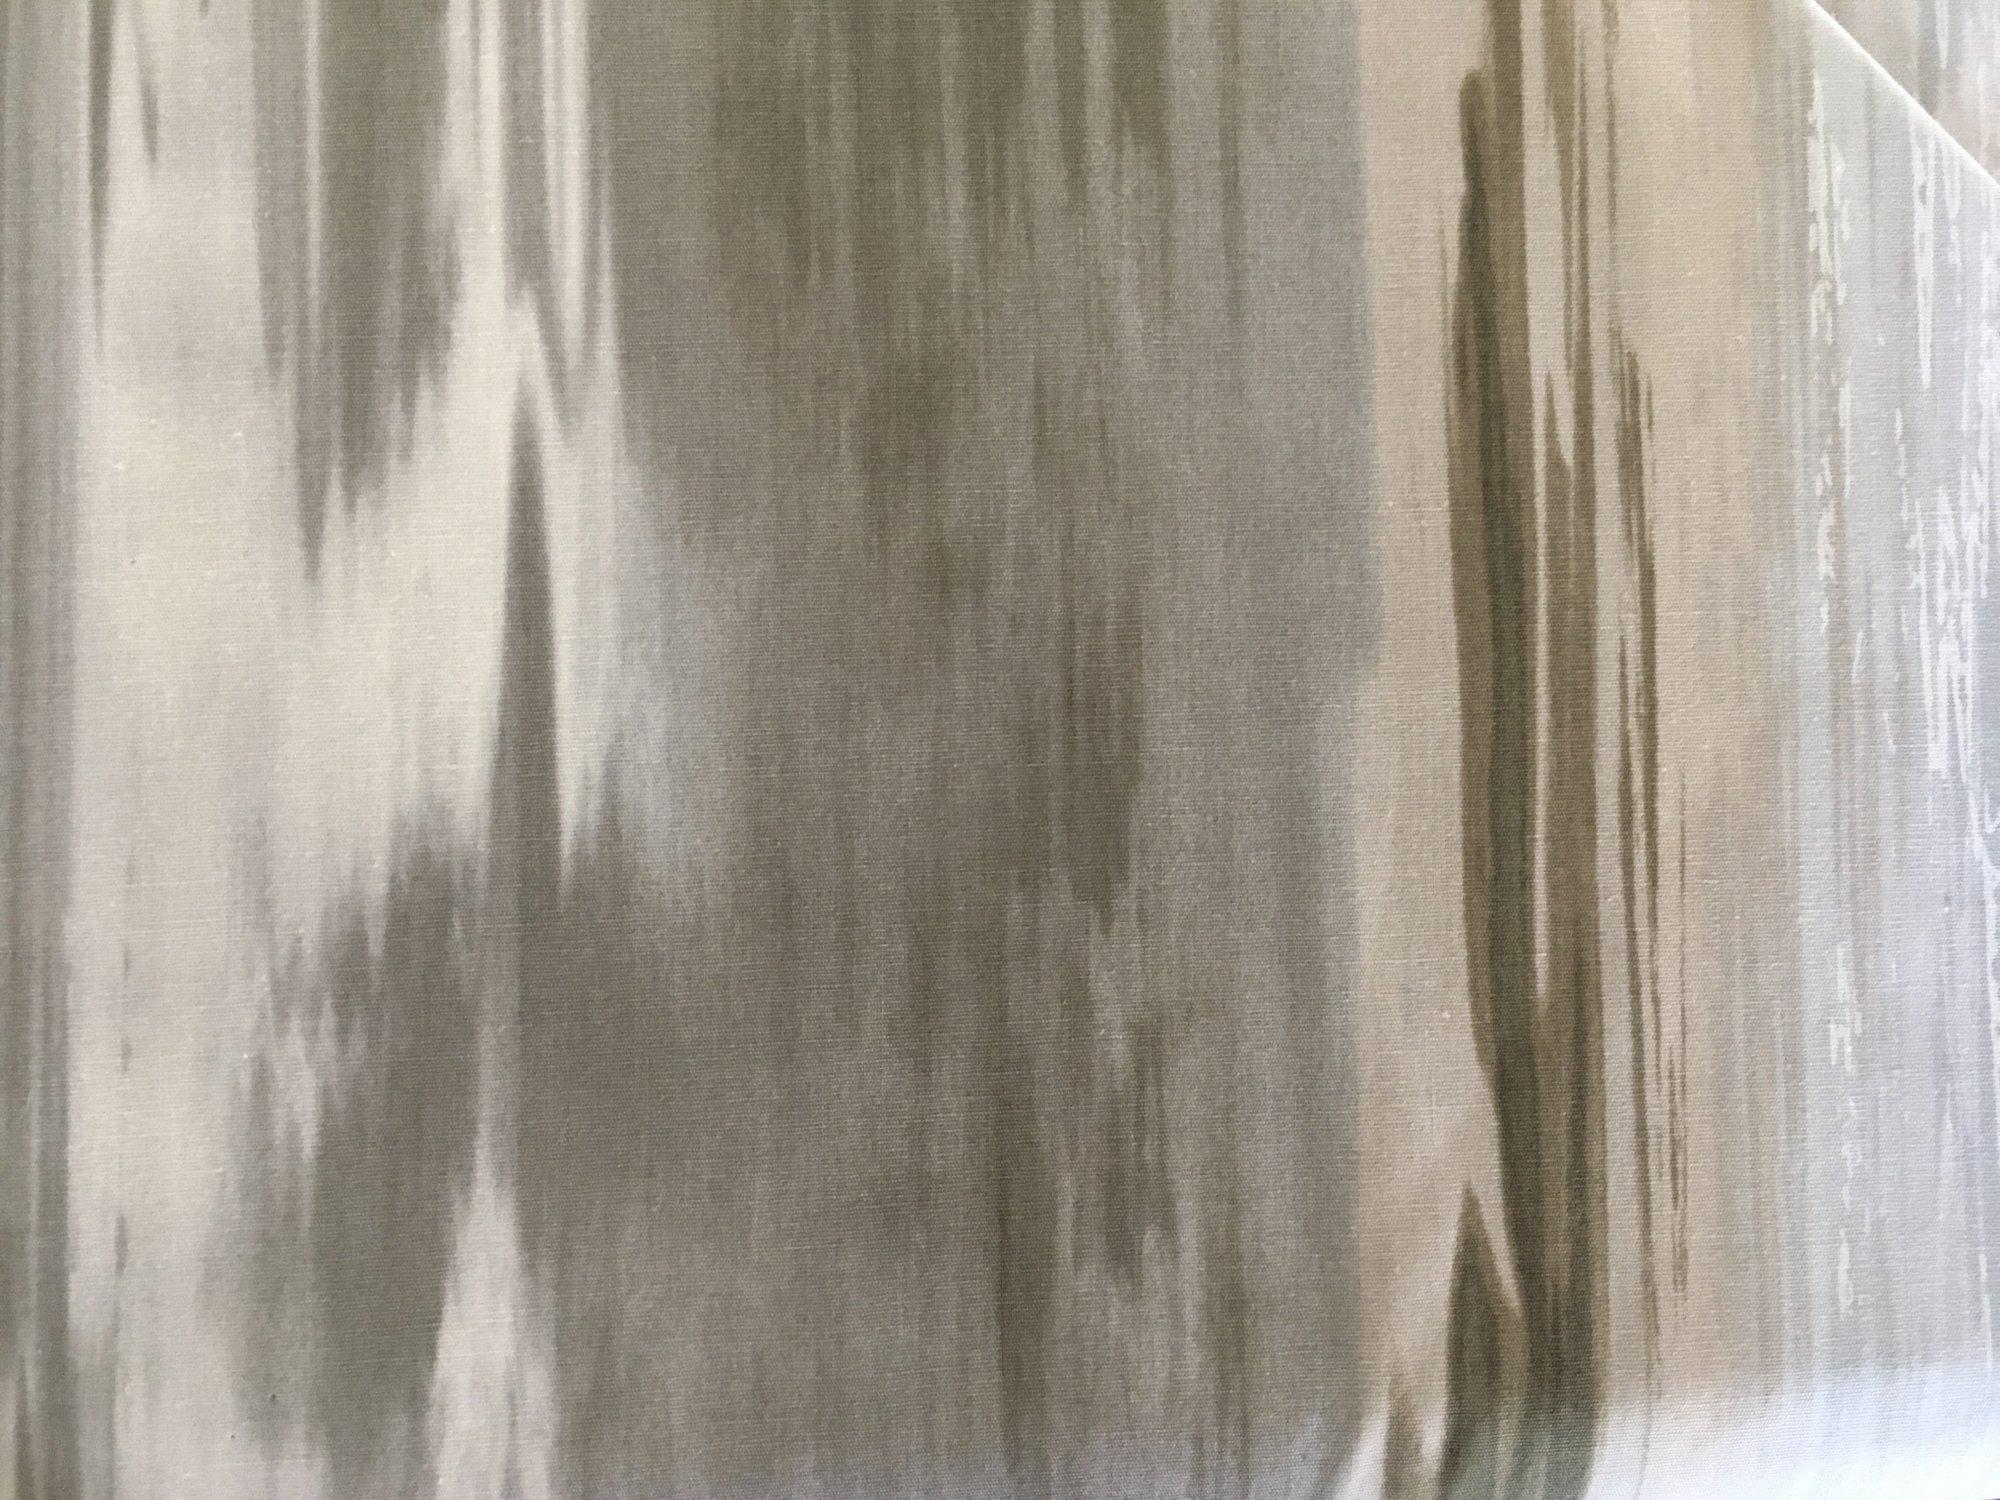 ENCHANTED PINES STRIATION GREY/CREAM/BROWN 1547014 Robert Kaufman